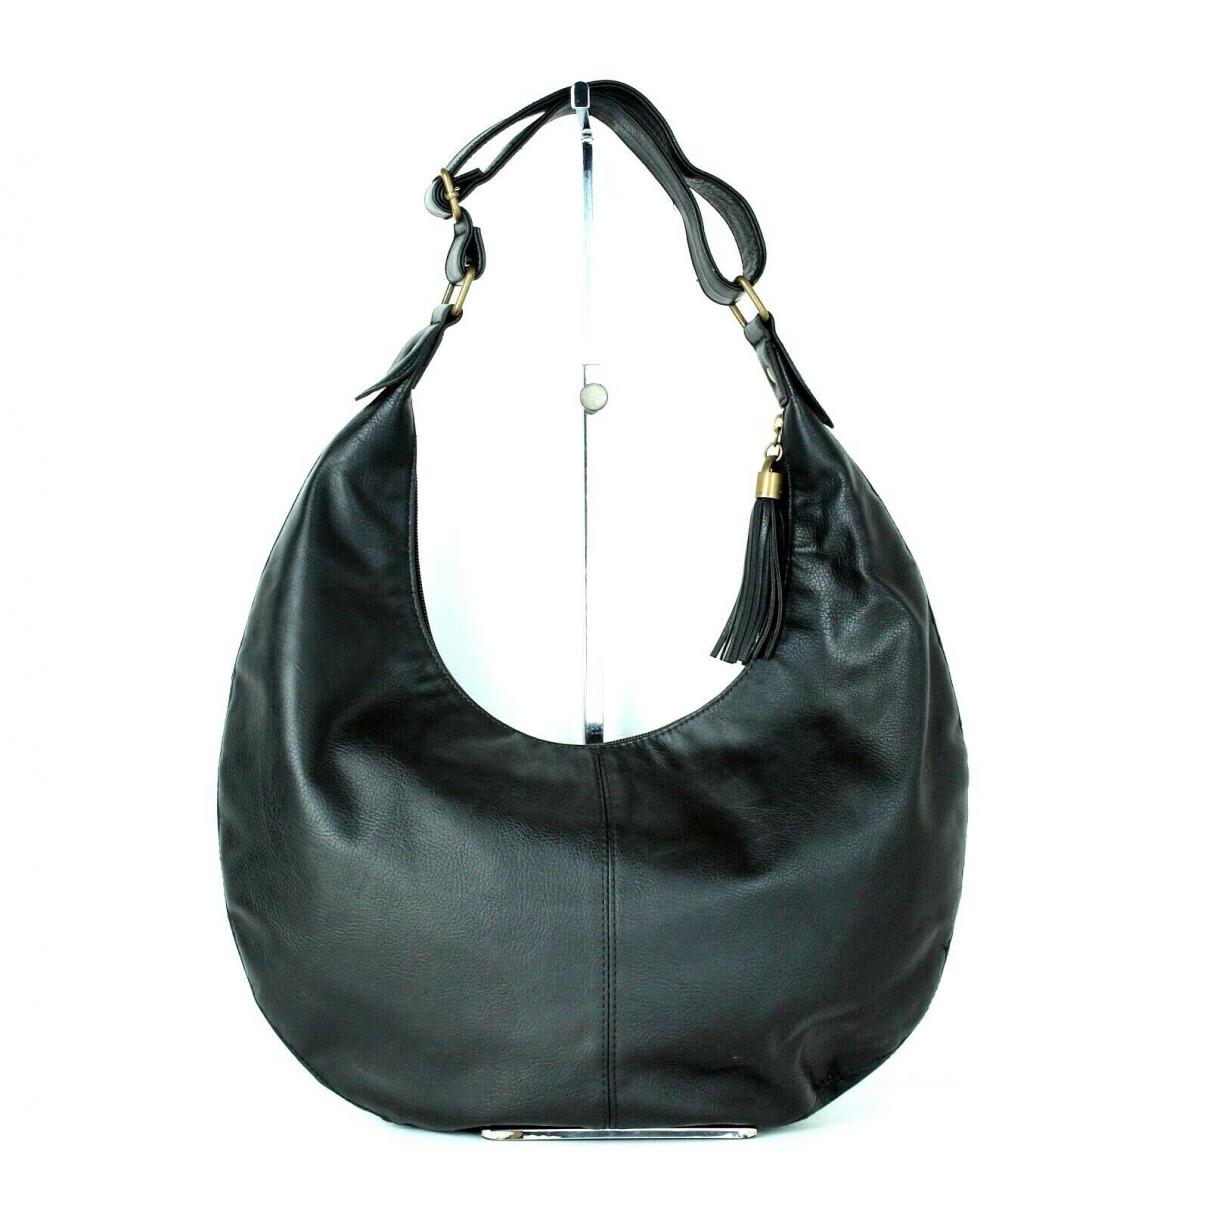 Givenchy \N Handtasche in  Schwarz Leder